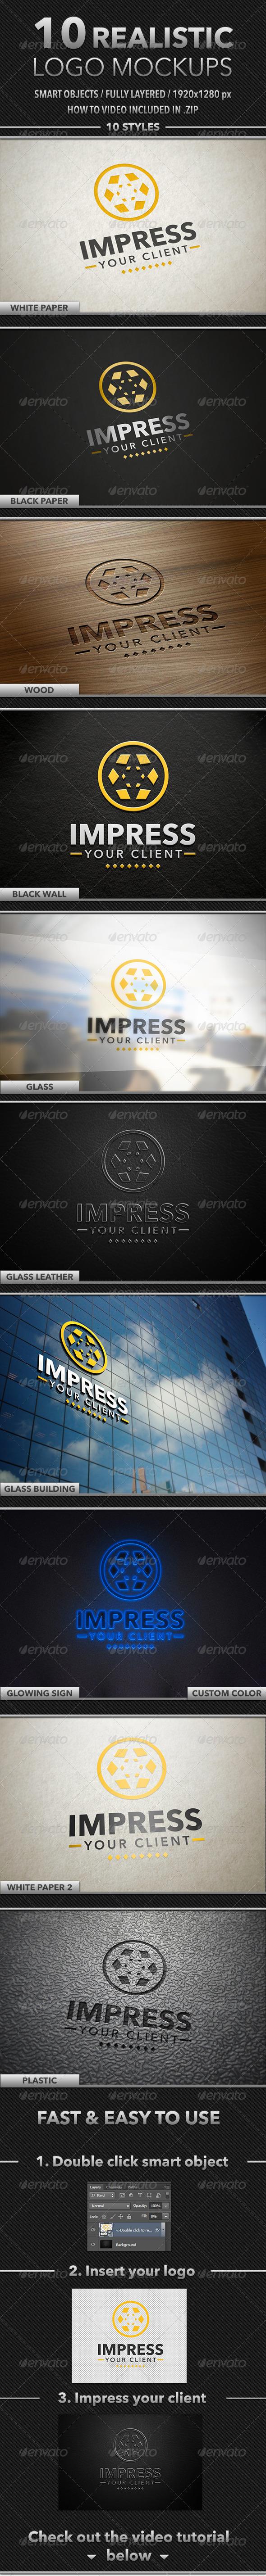 10 Realistic Logo Mockups - Logo Product Mock-Ups